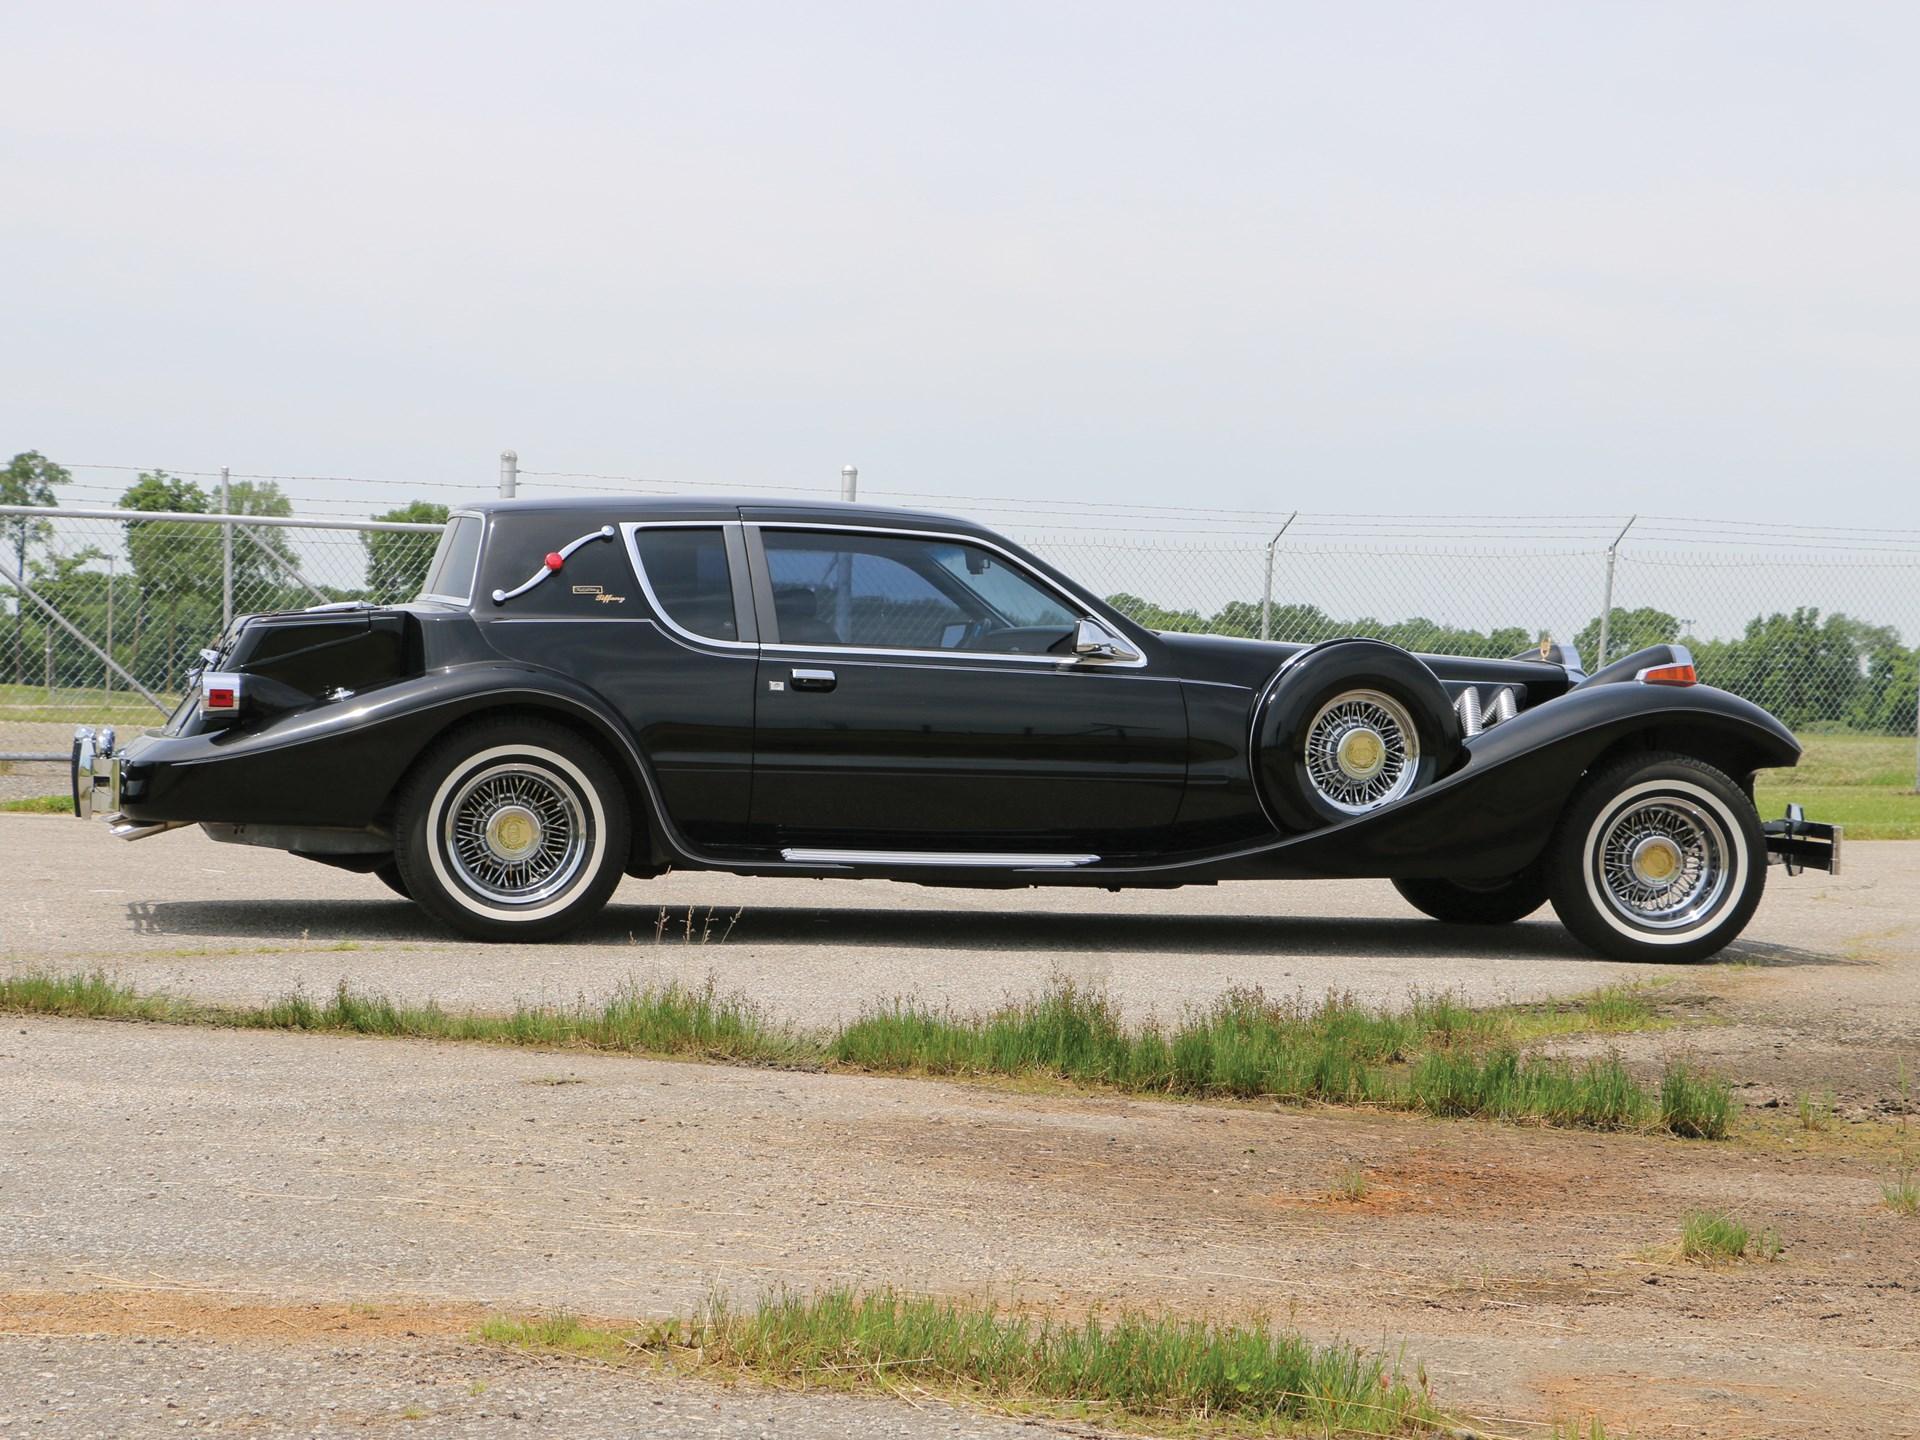 1984 CMC Tiffany Gold Edition